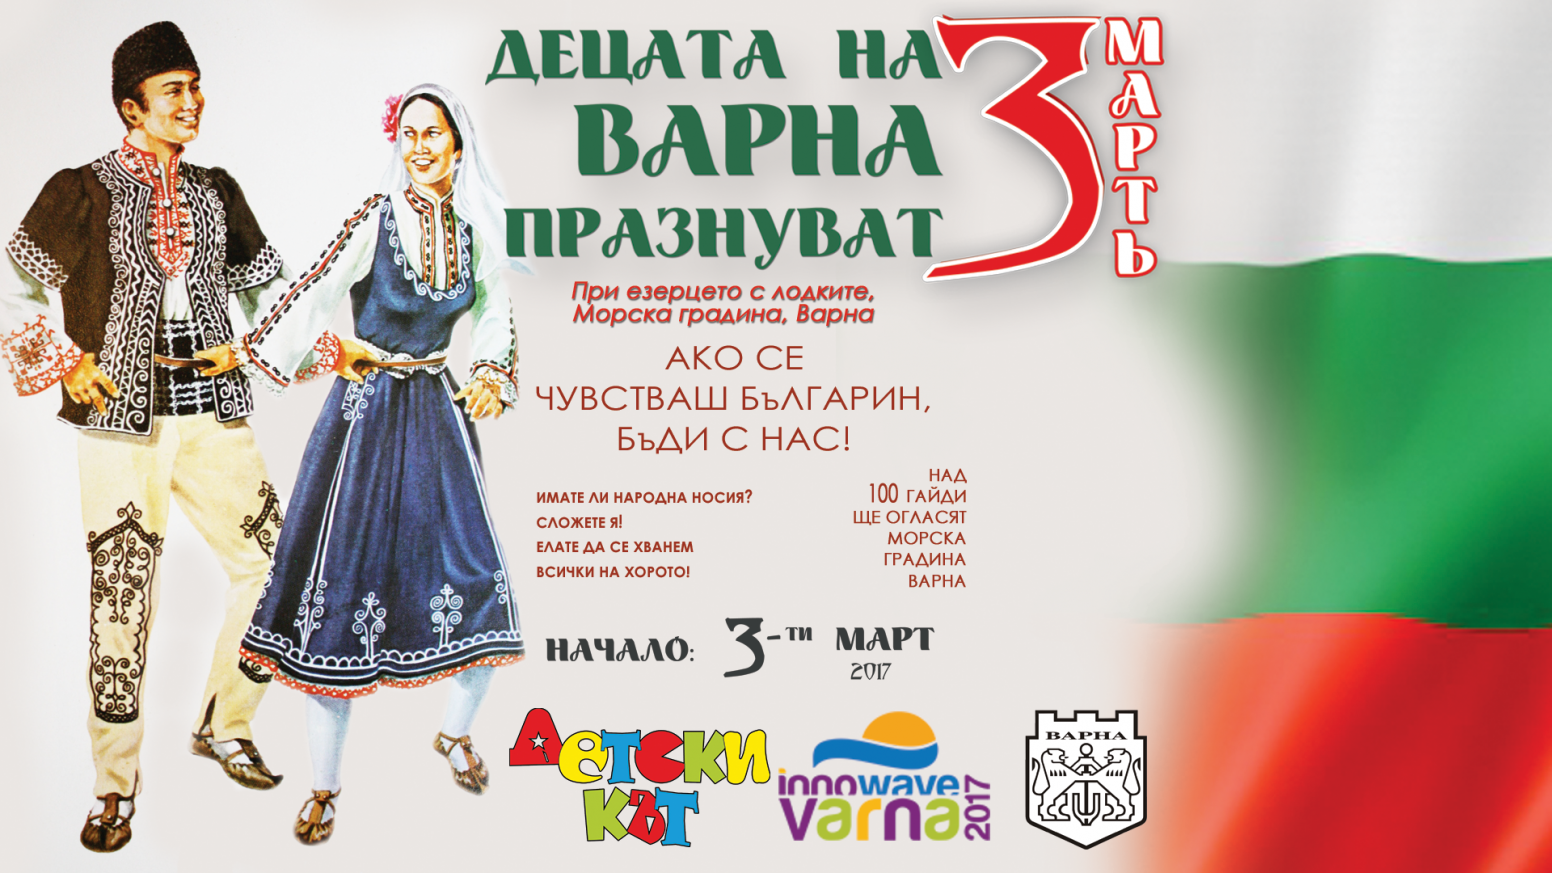 Децата на Варна празнуват 3 март